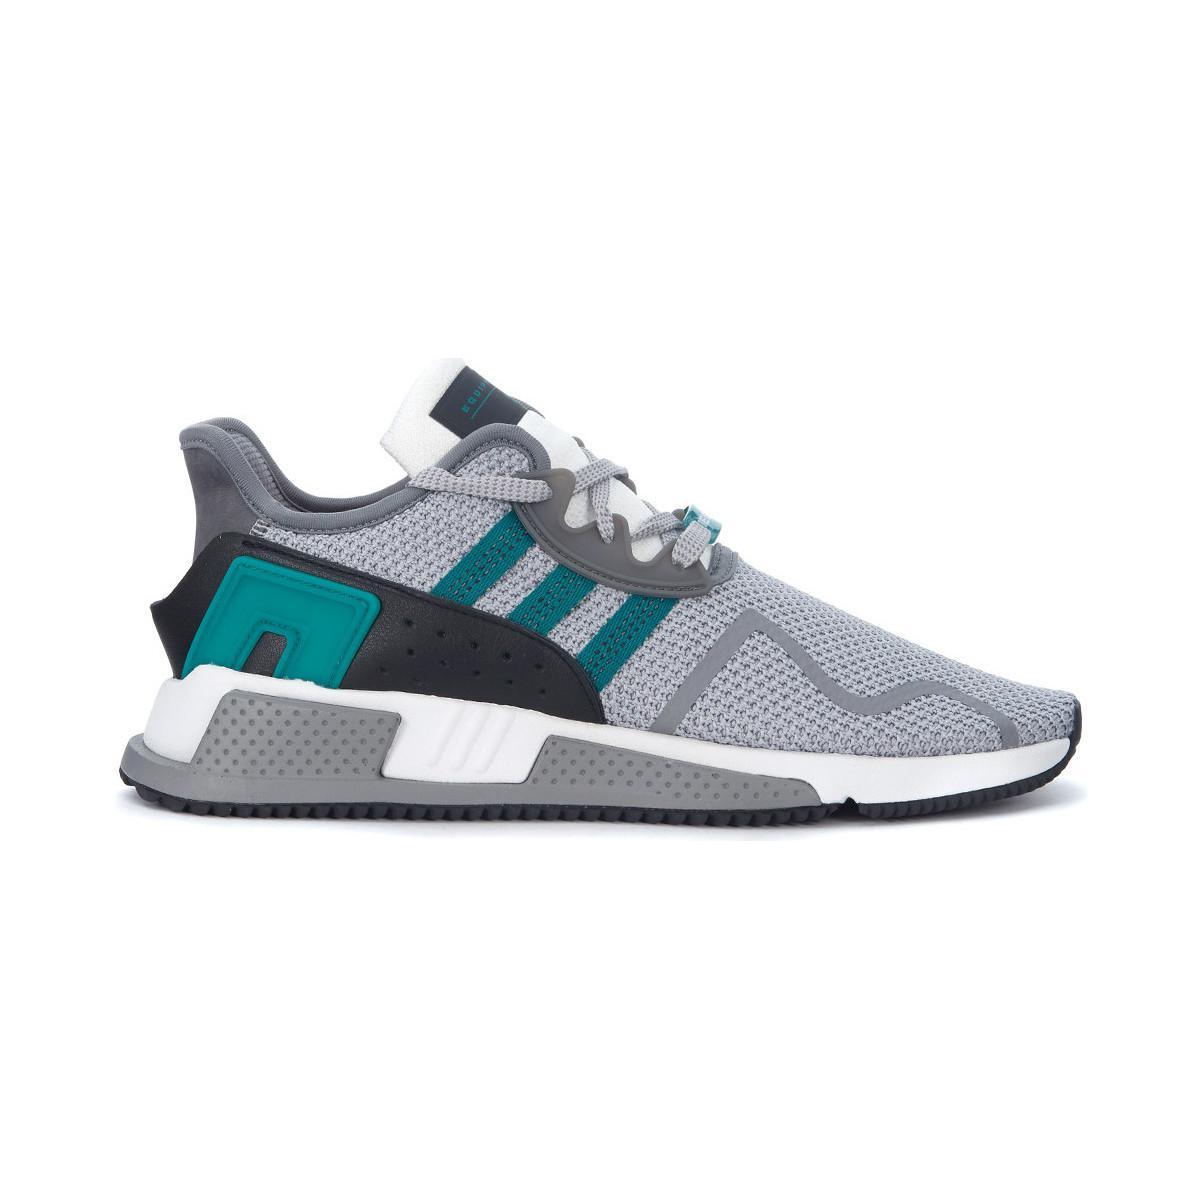 reputable site cadad 66763 adidas Sneaker Eqt Cushion Con Tomaia Knit Grigia Men s Trainers In ...